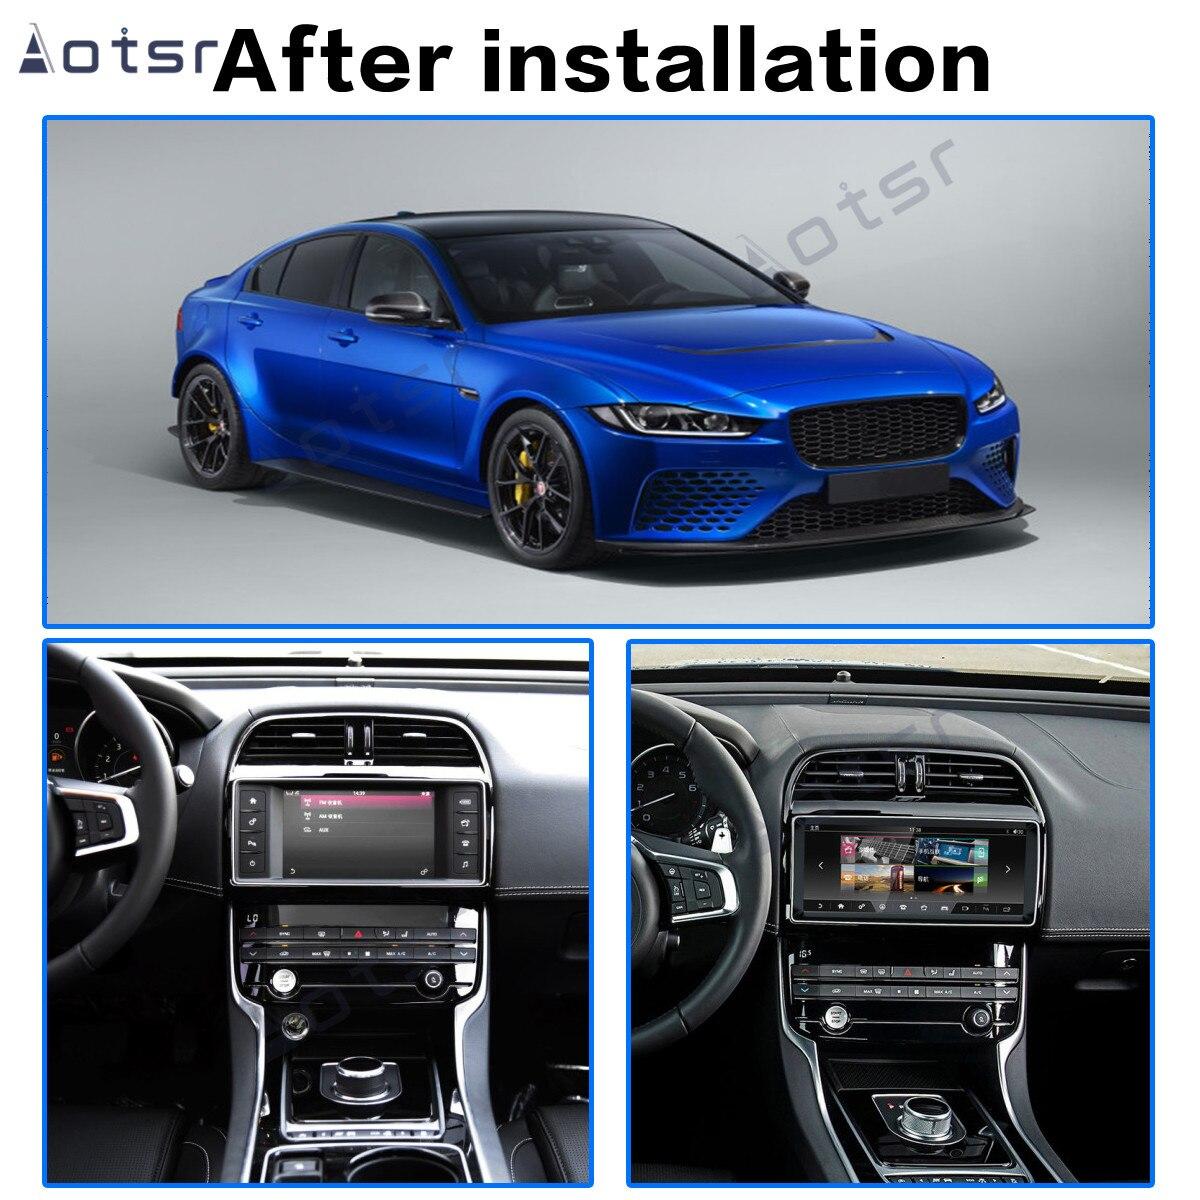 Aotsr Car Multimedia Player Stereo GPS DVD Radio NAVI Navigation Android 9.0 64GB Screen System for Jaguar XE 2016-2018 Carplay